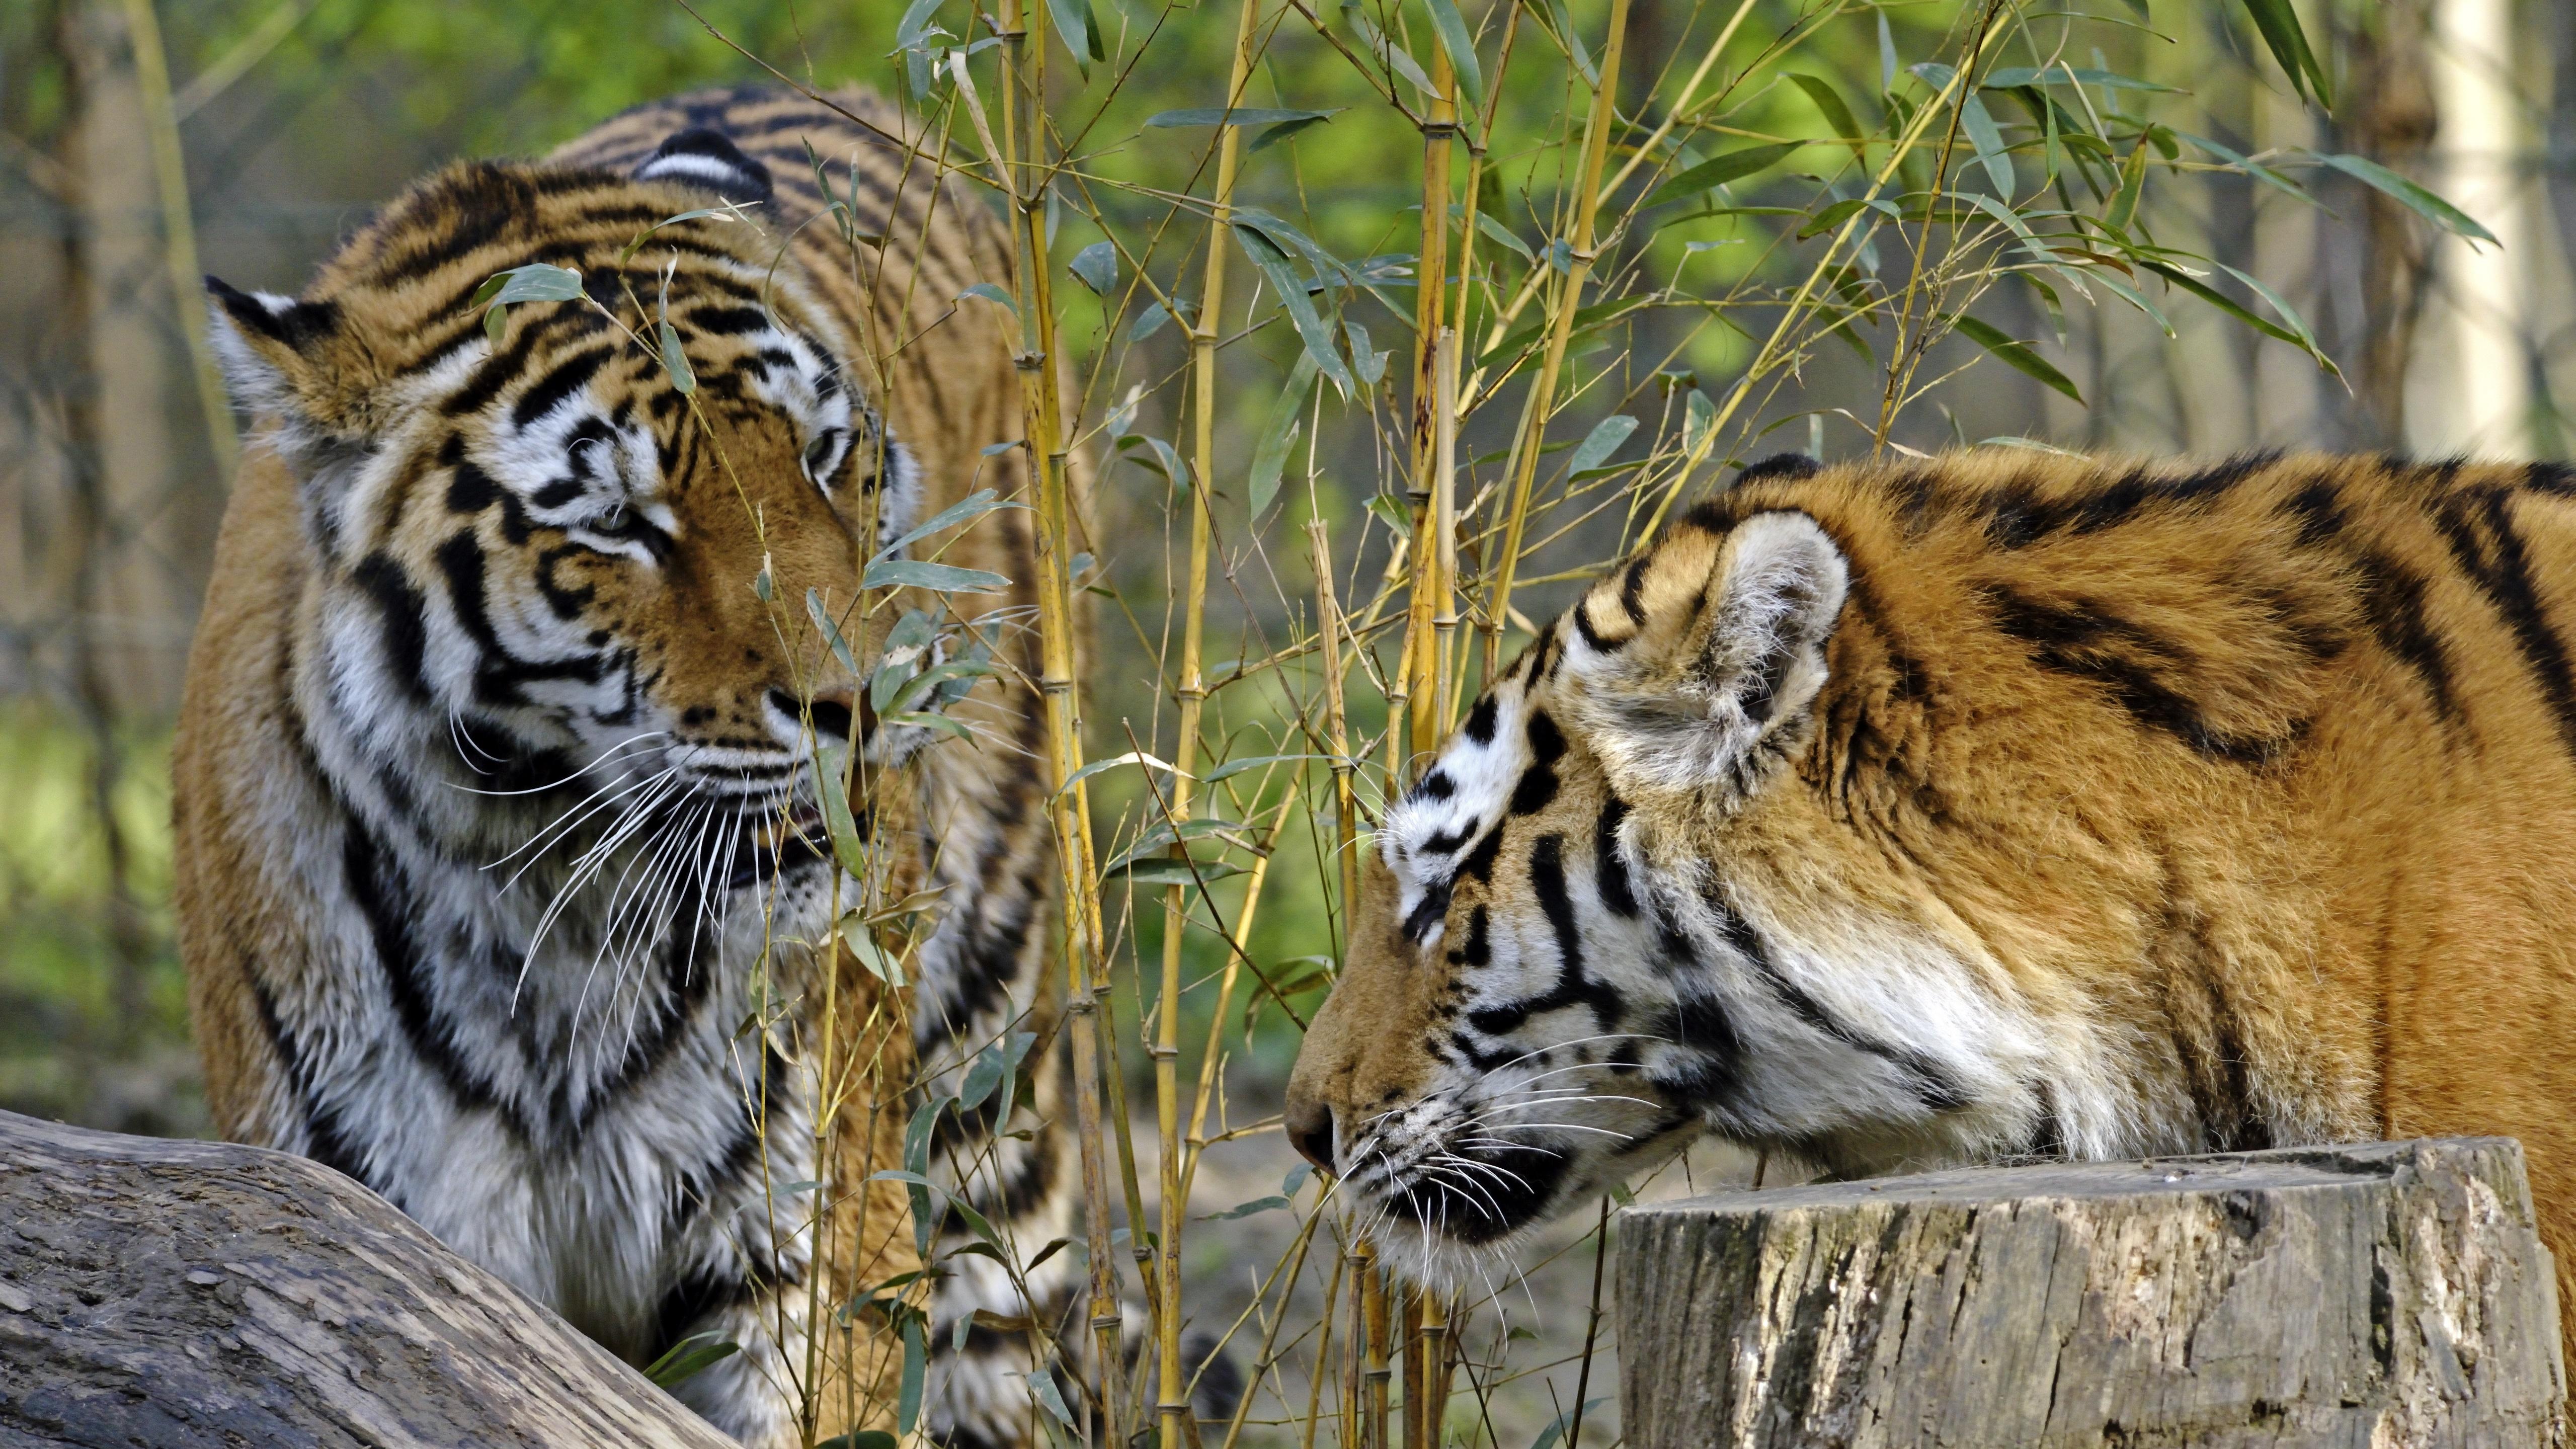 Siberian tigers wallpaper